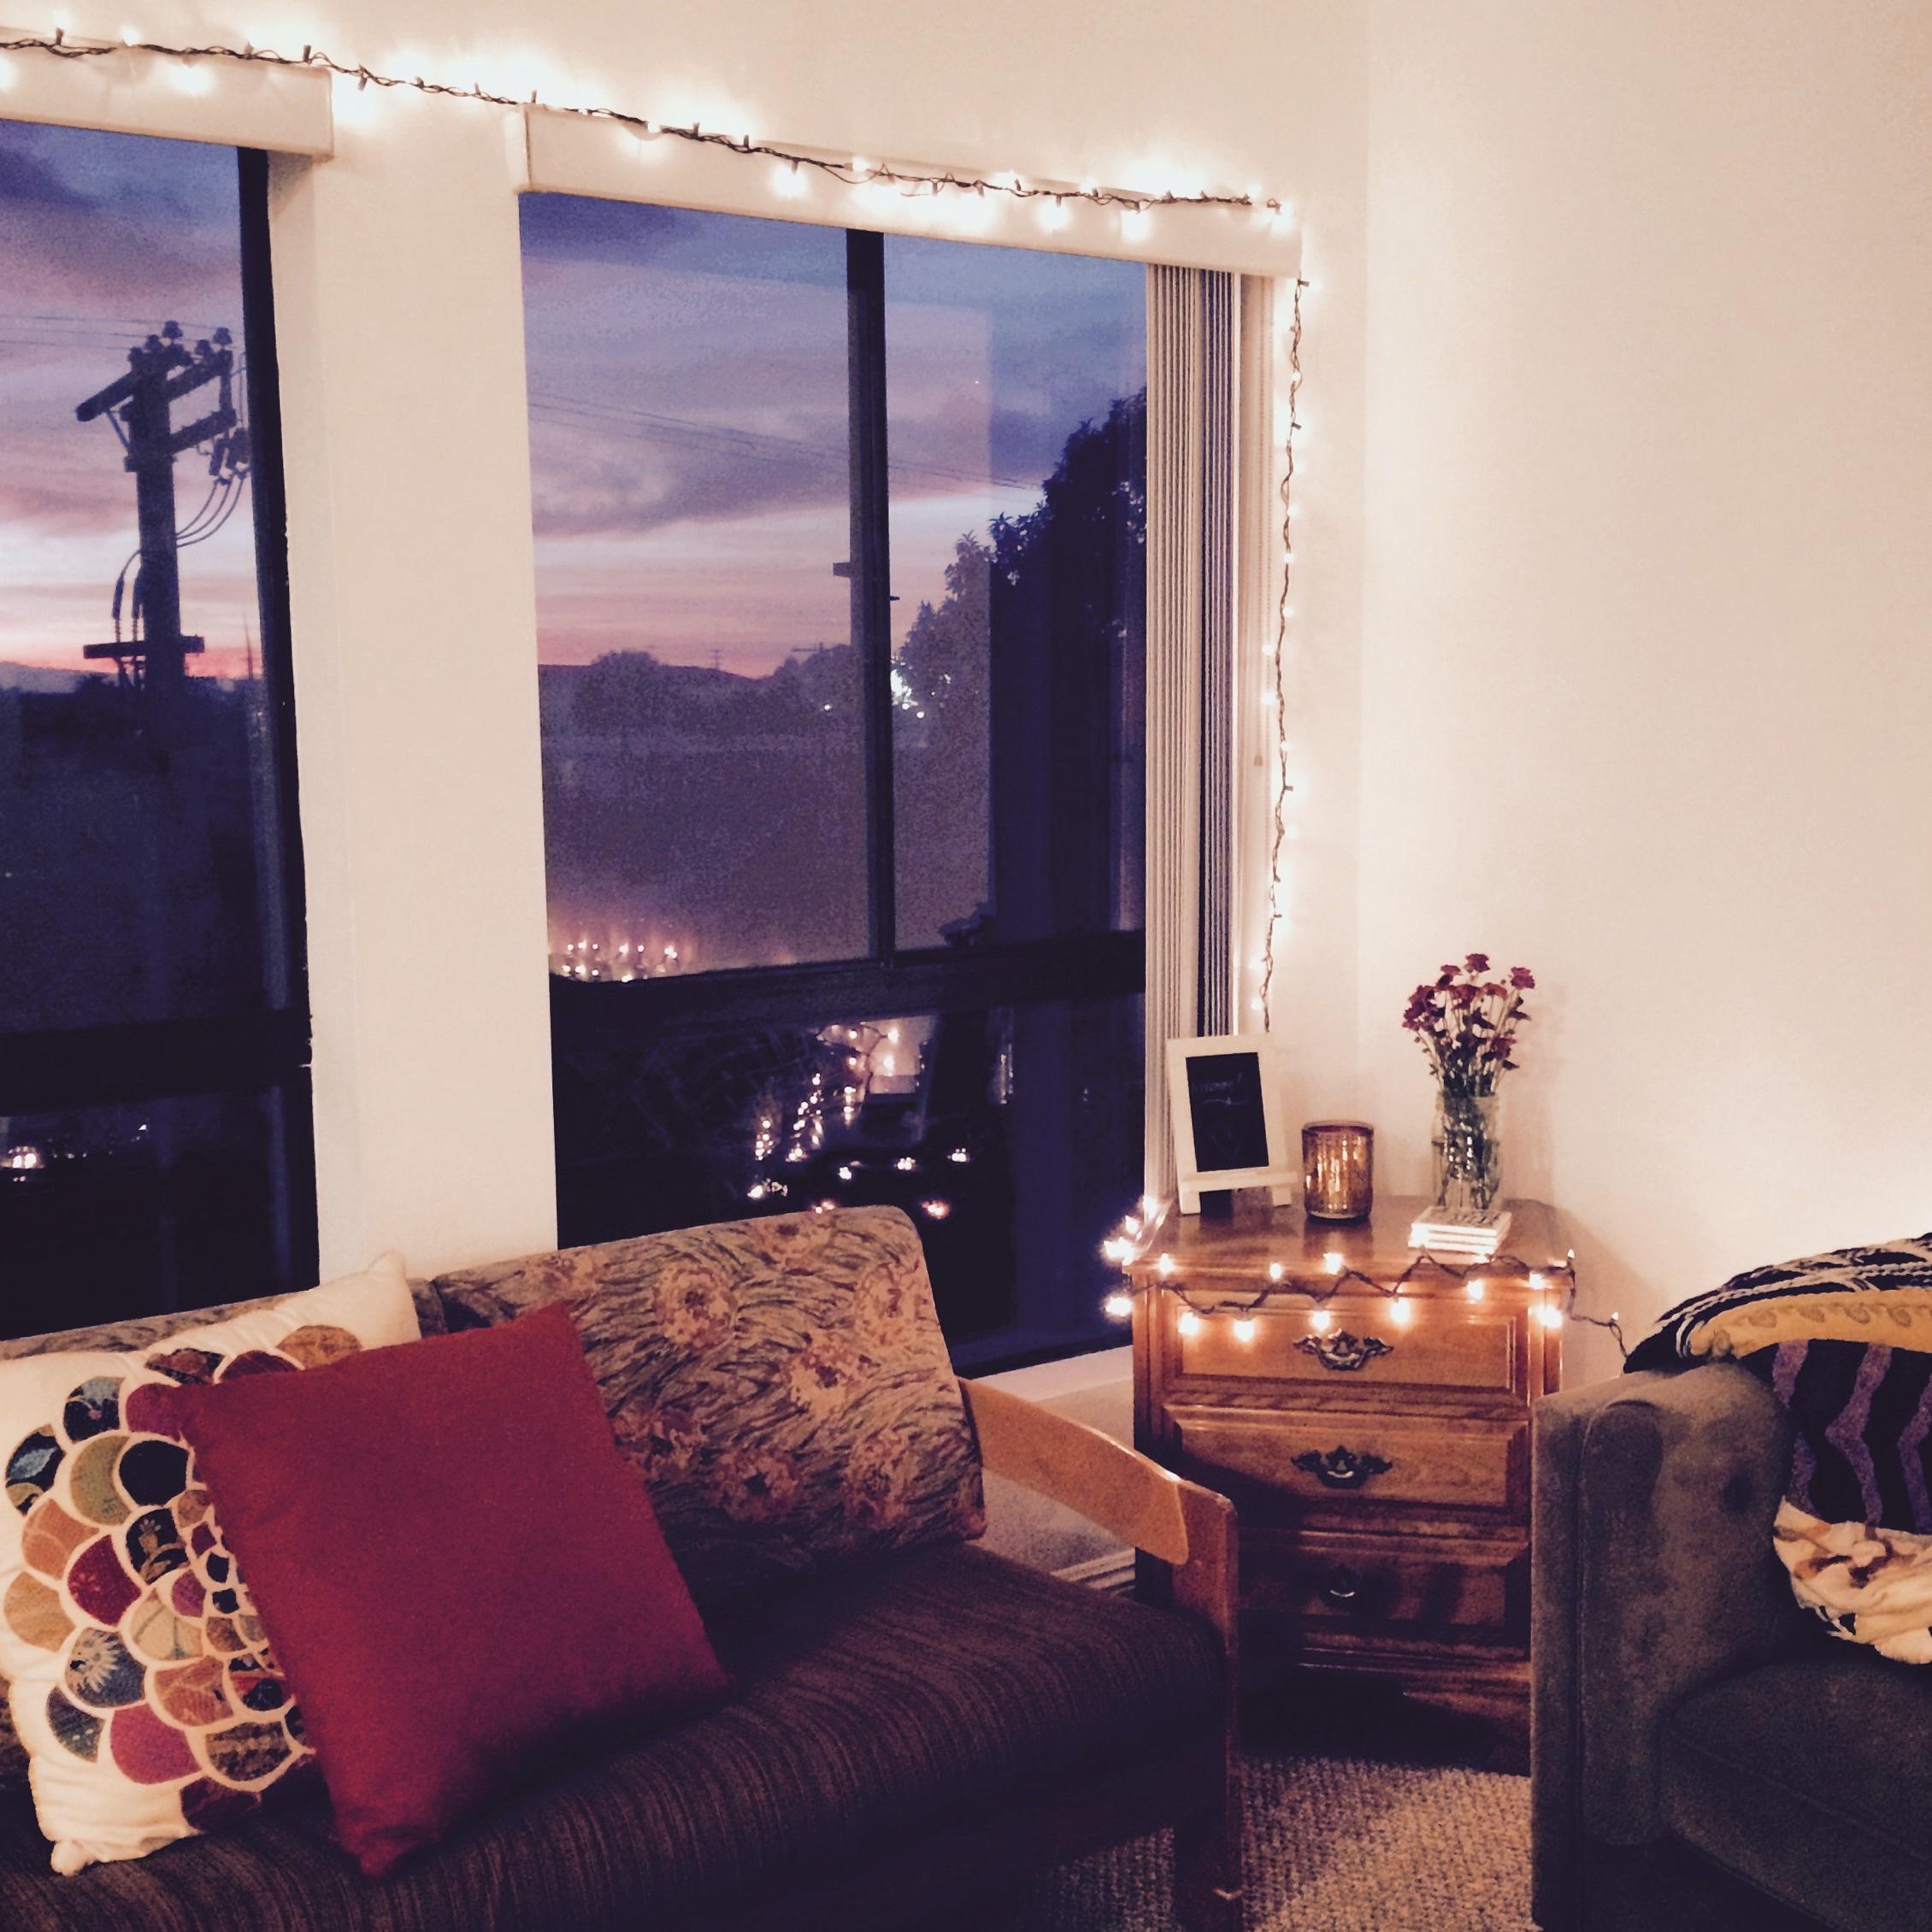 anthropologie-inspired apartment decor